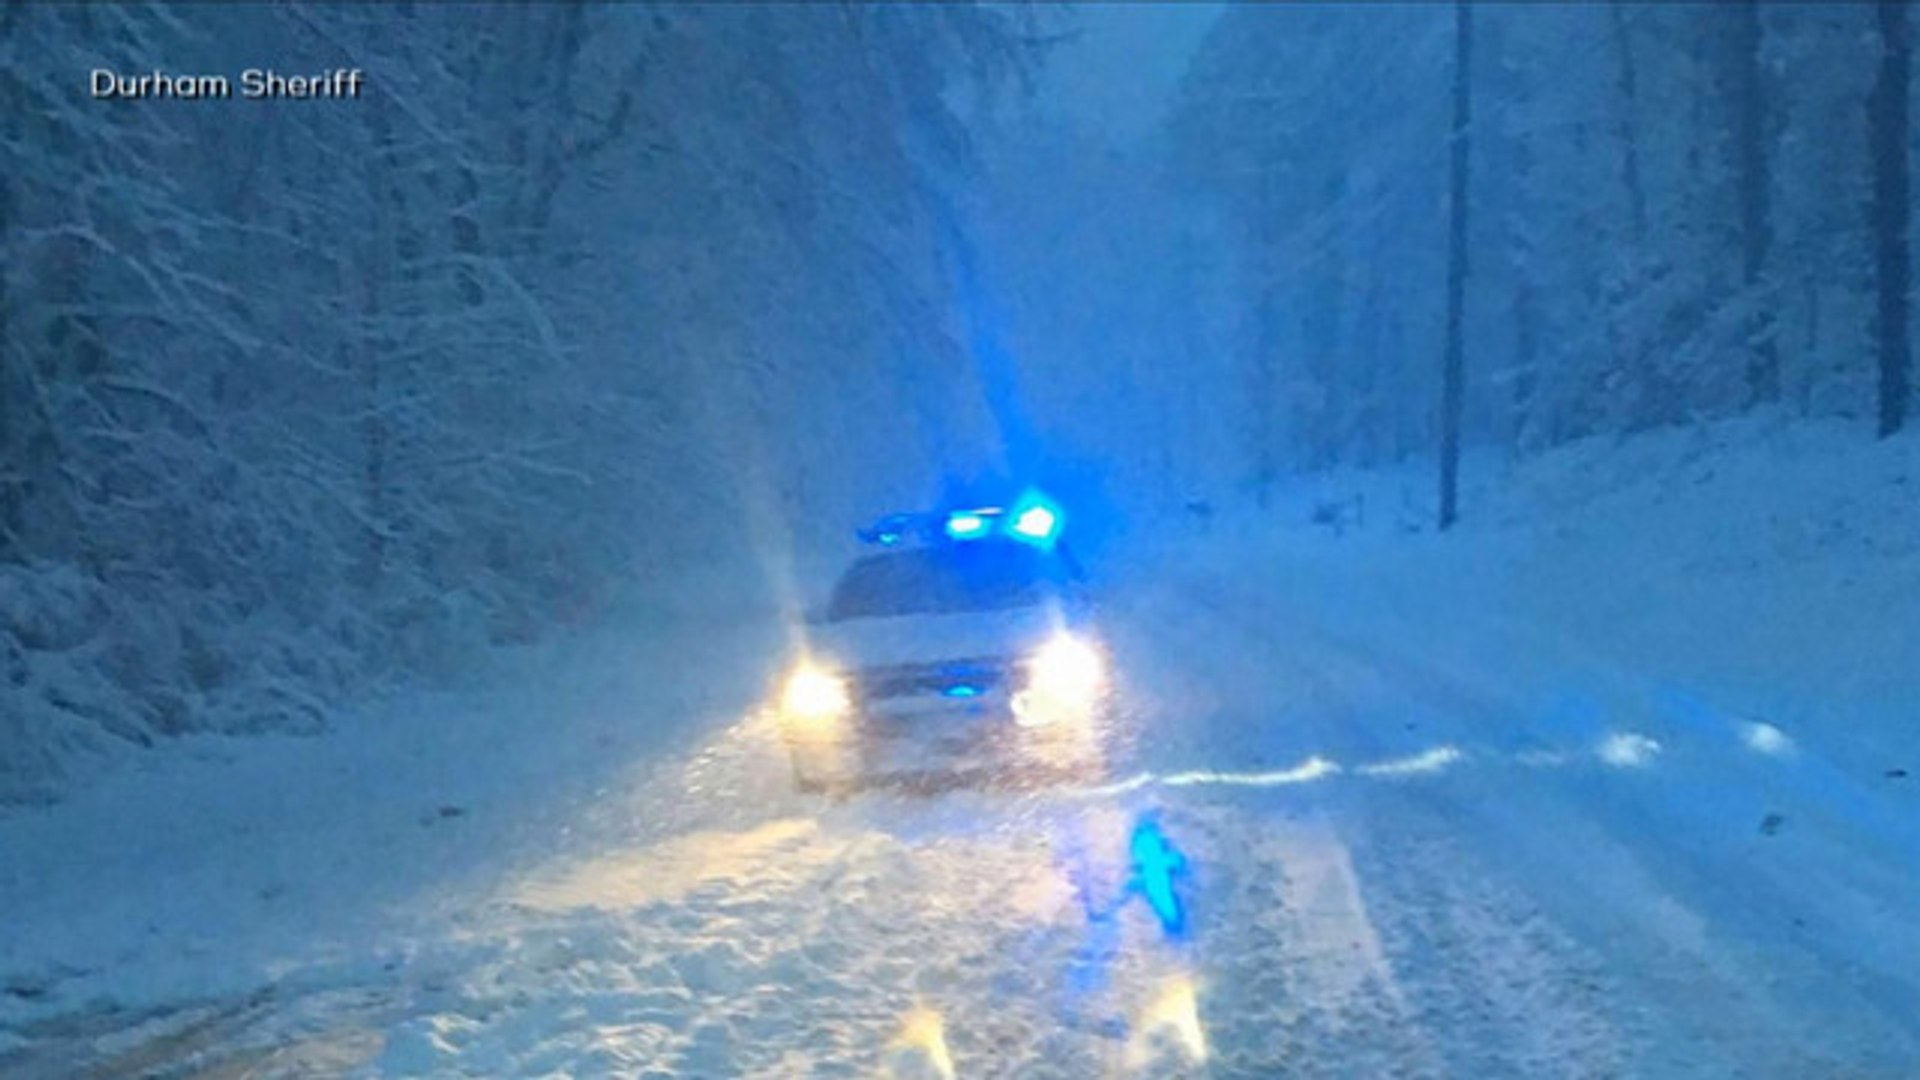 Major snowstorm buries North Carolina and Virginia